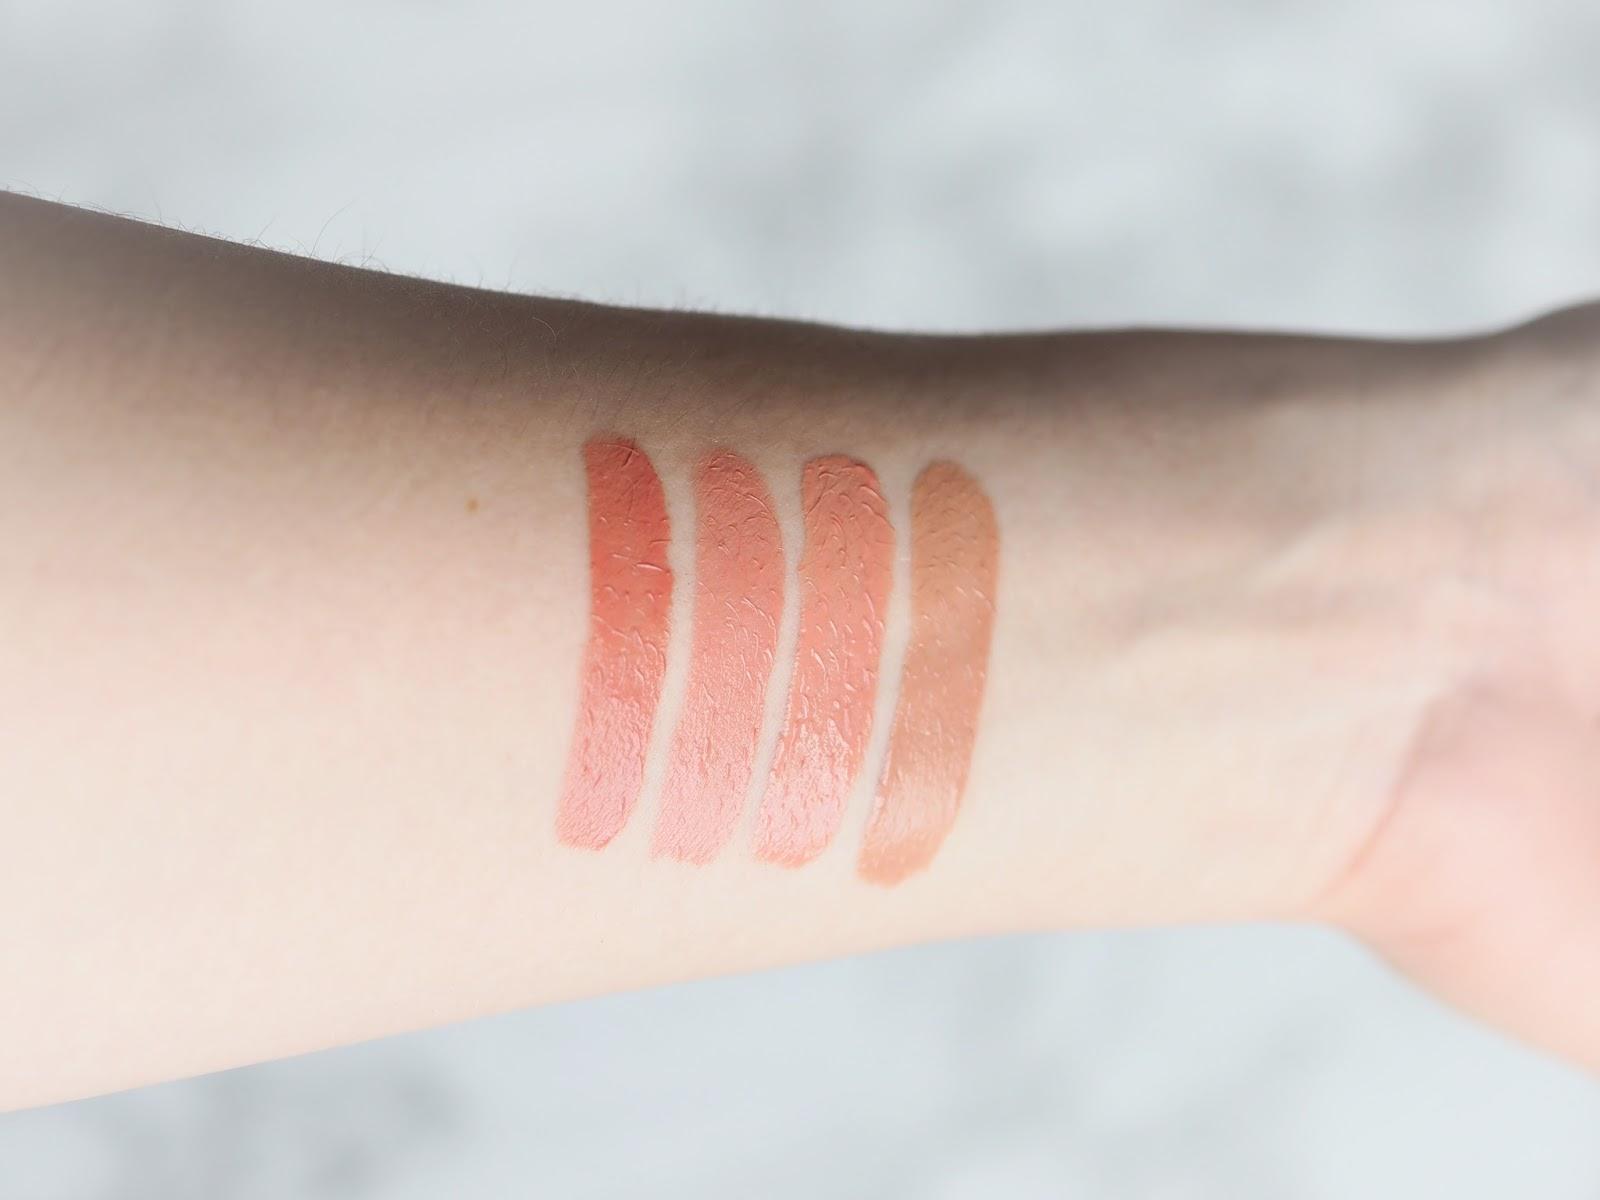 KKW By Kylie Cosmetics Crème Liquid Lipstick, review, first impressions, swatches, kim, kiki, kimmy, kimberly, blog